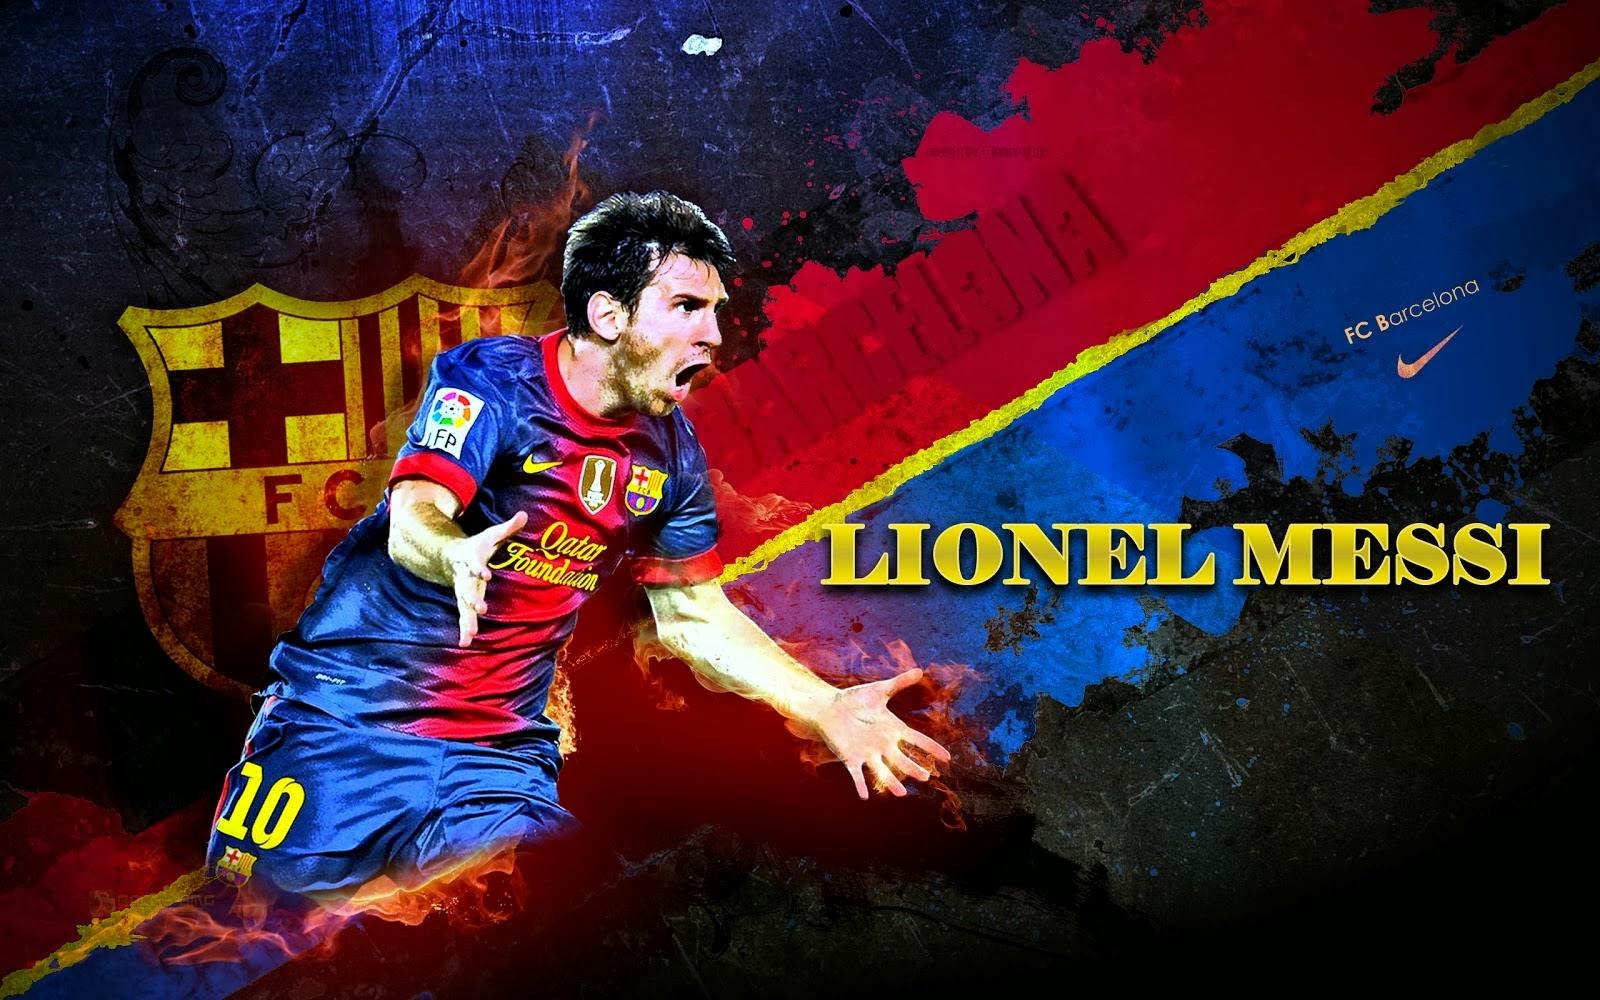 Lionel Messi HD Wallpapers 2014jpg 1600x1000